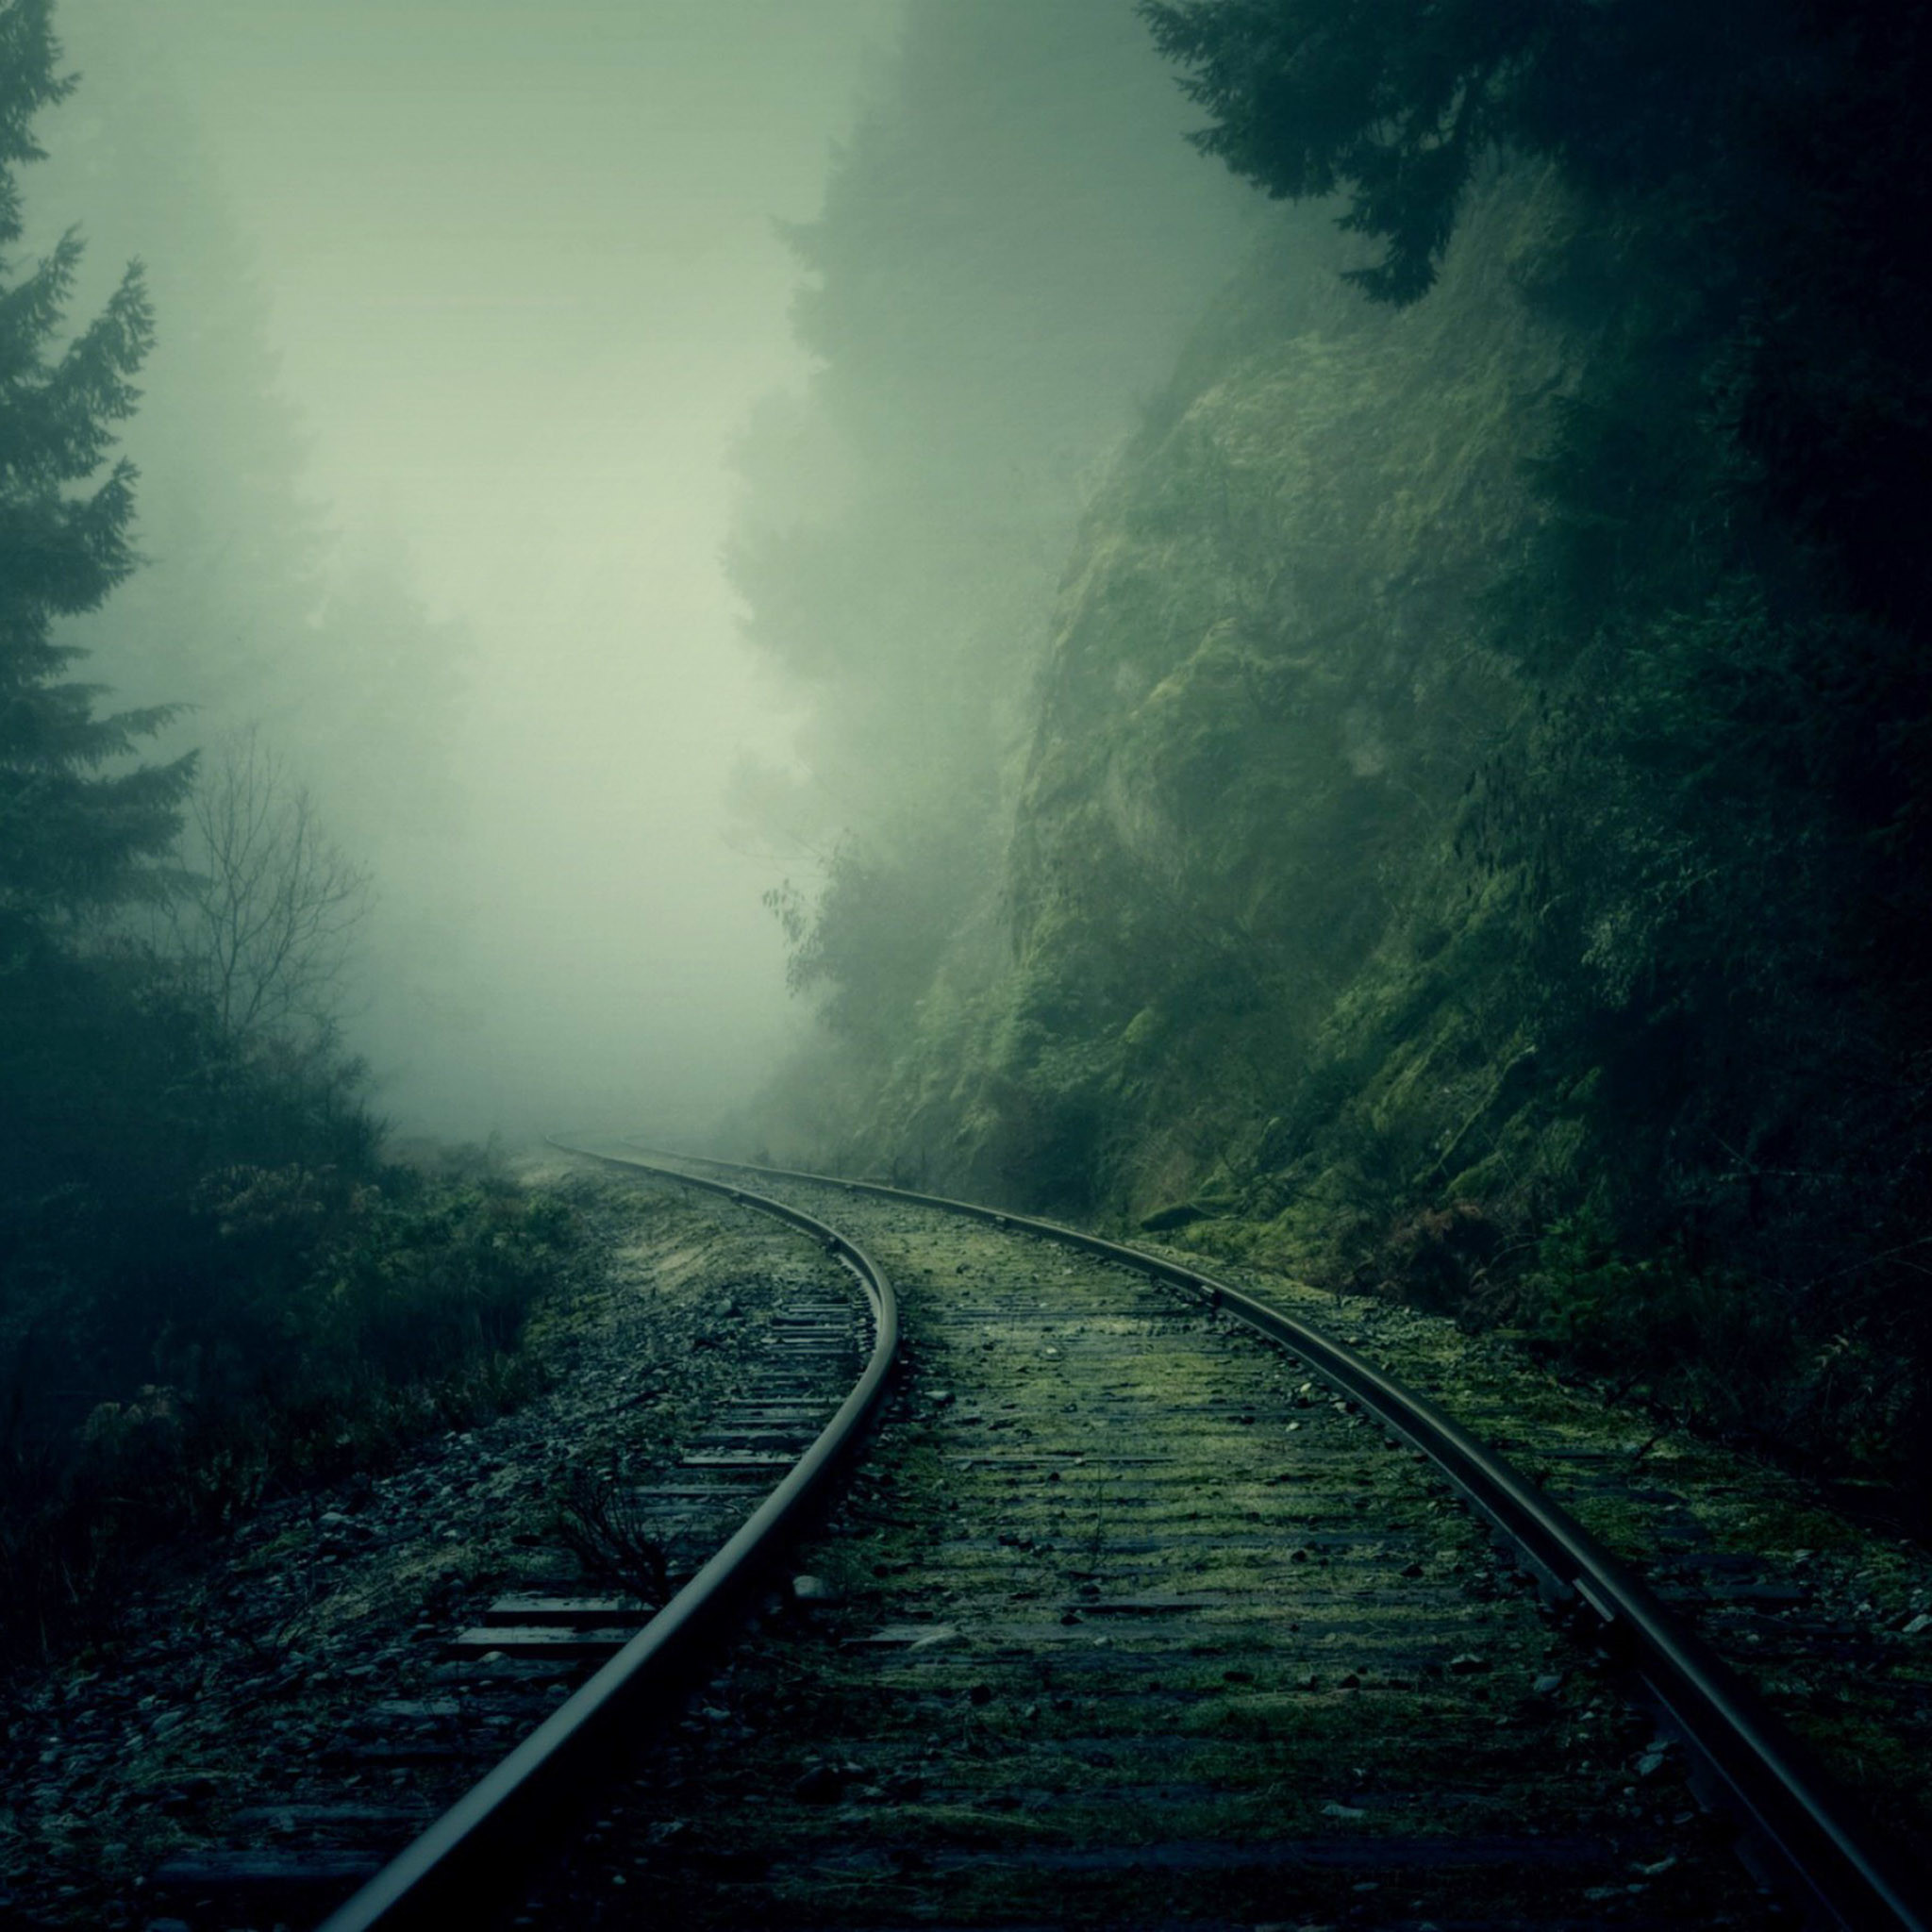 2653 3: Foggy Train Tracks Forest iPad wallpaper